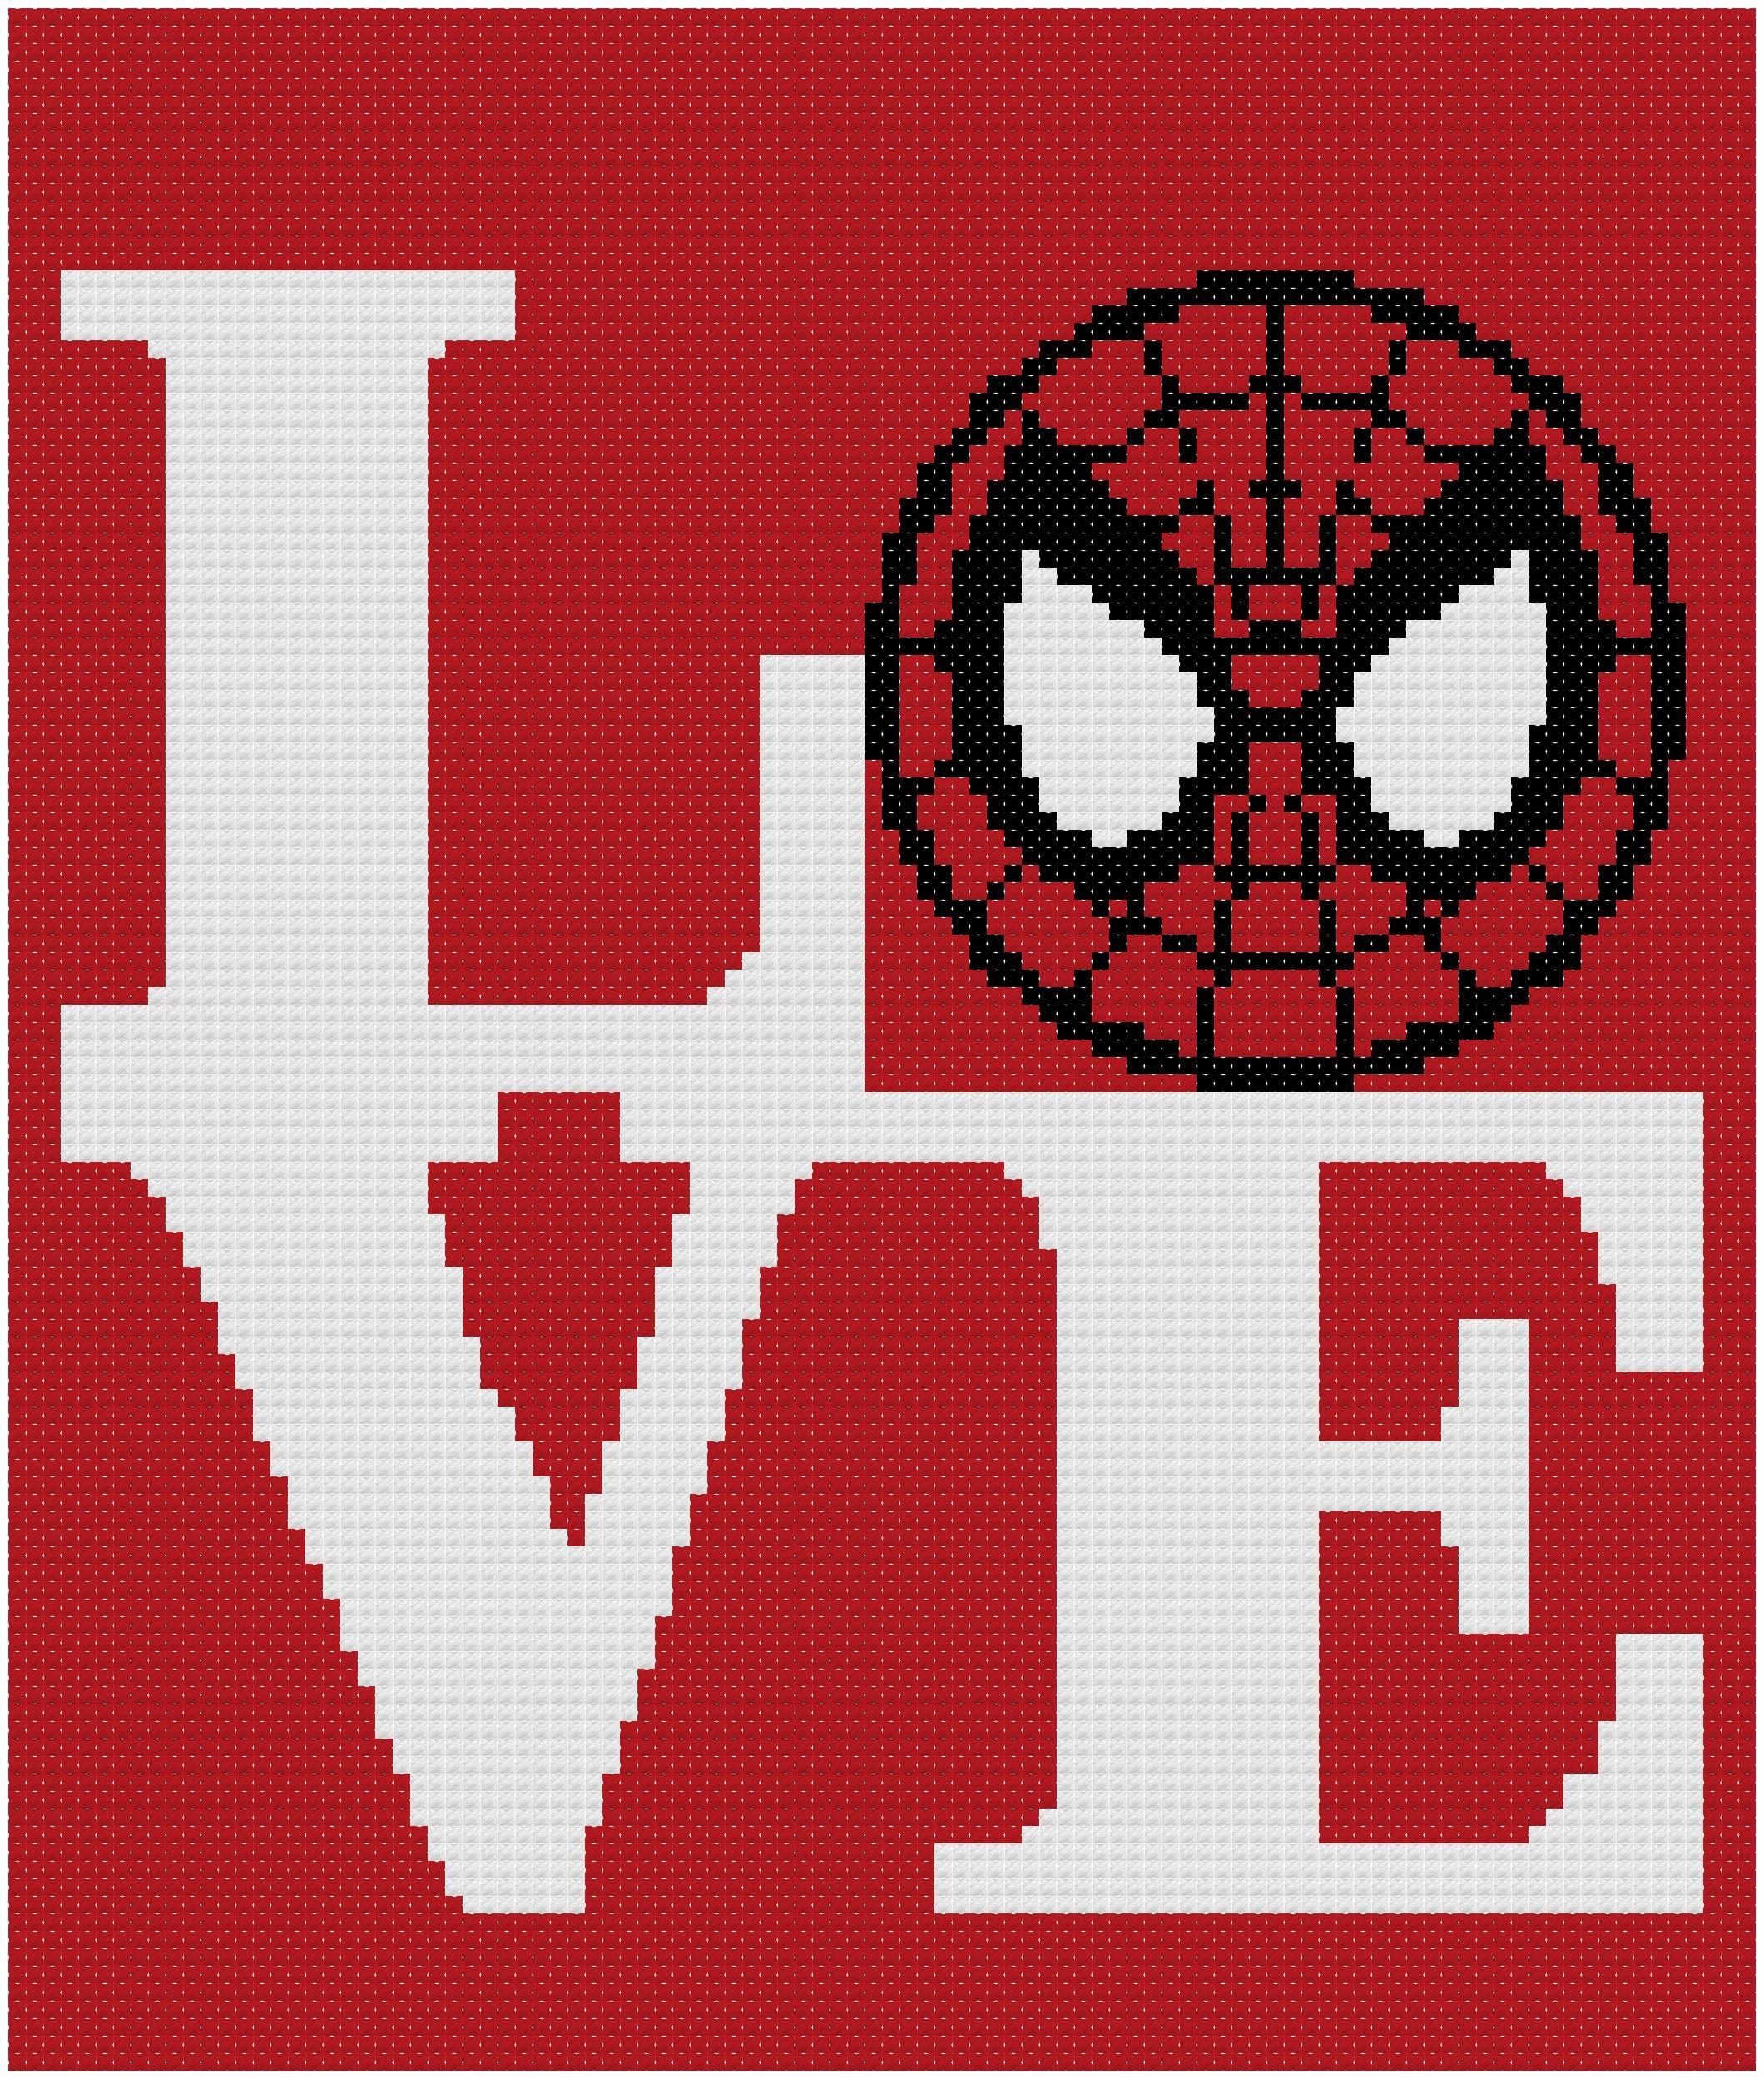 Spiderman cross stitch patternavengers cross chartmarvel cross this is a digital file jeuxipadfo Images